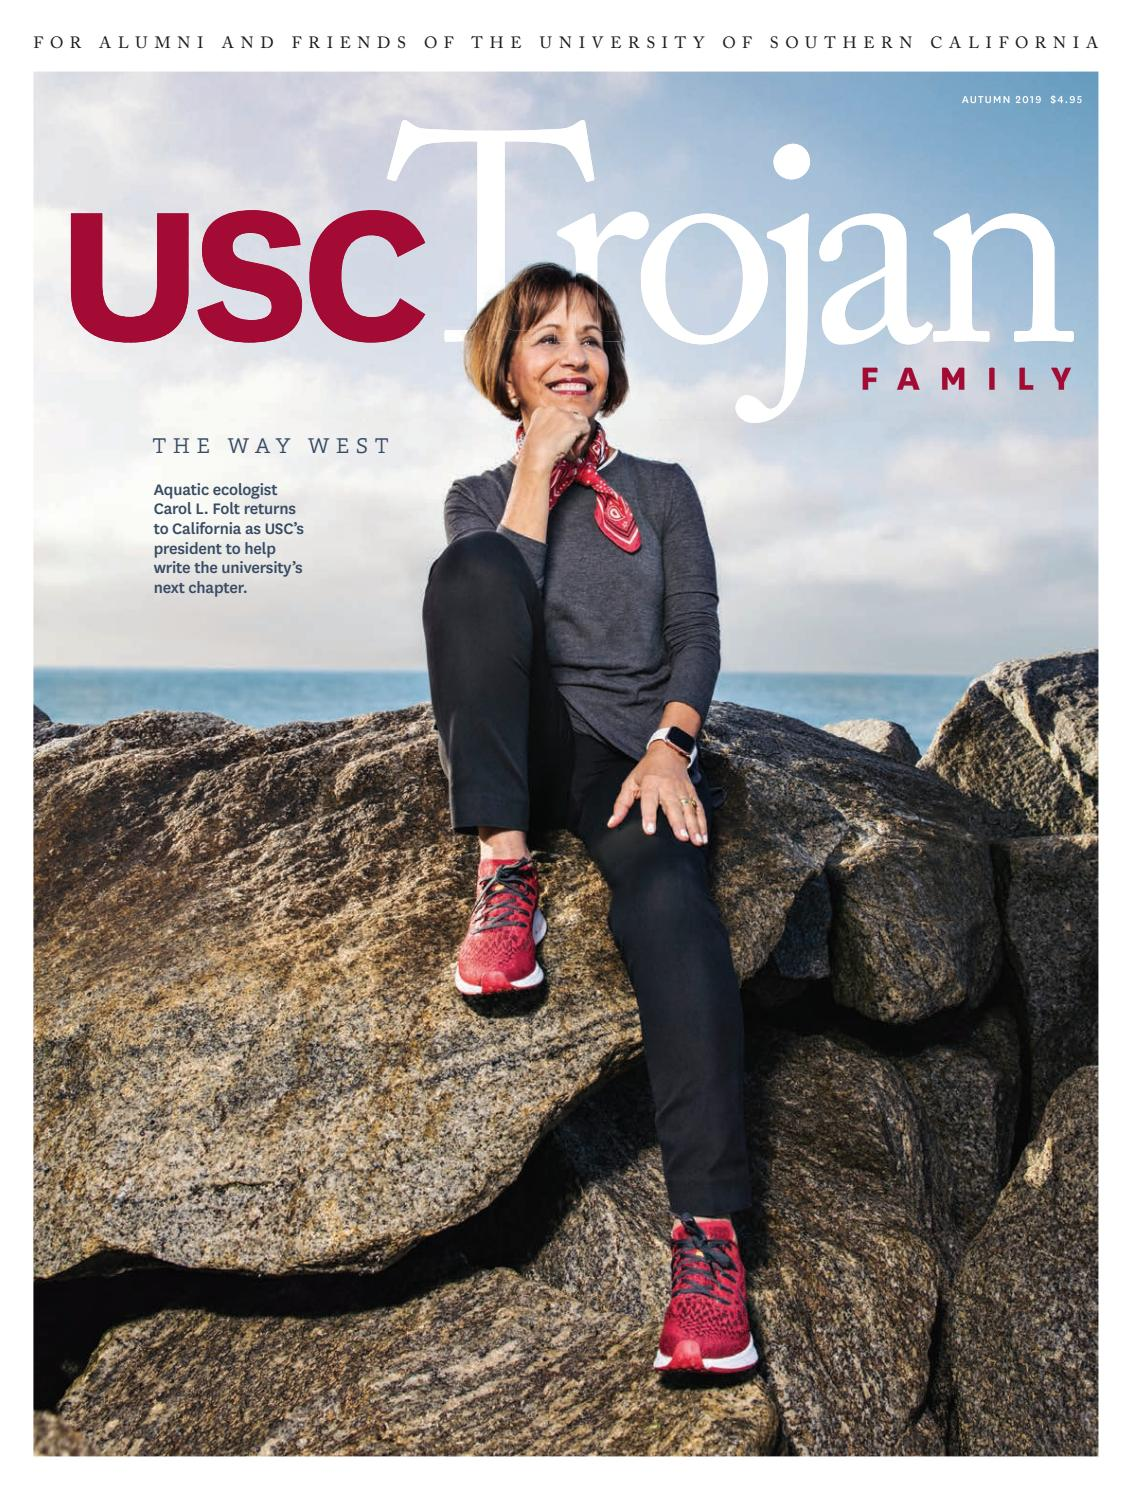 Usc Trojan Family Magazine Autumn 2019 By University Of Southern California Issuu